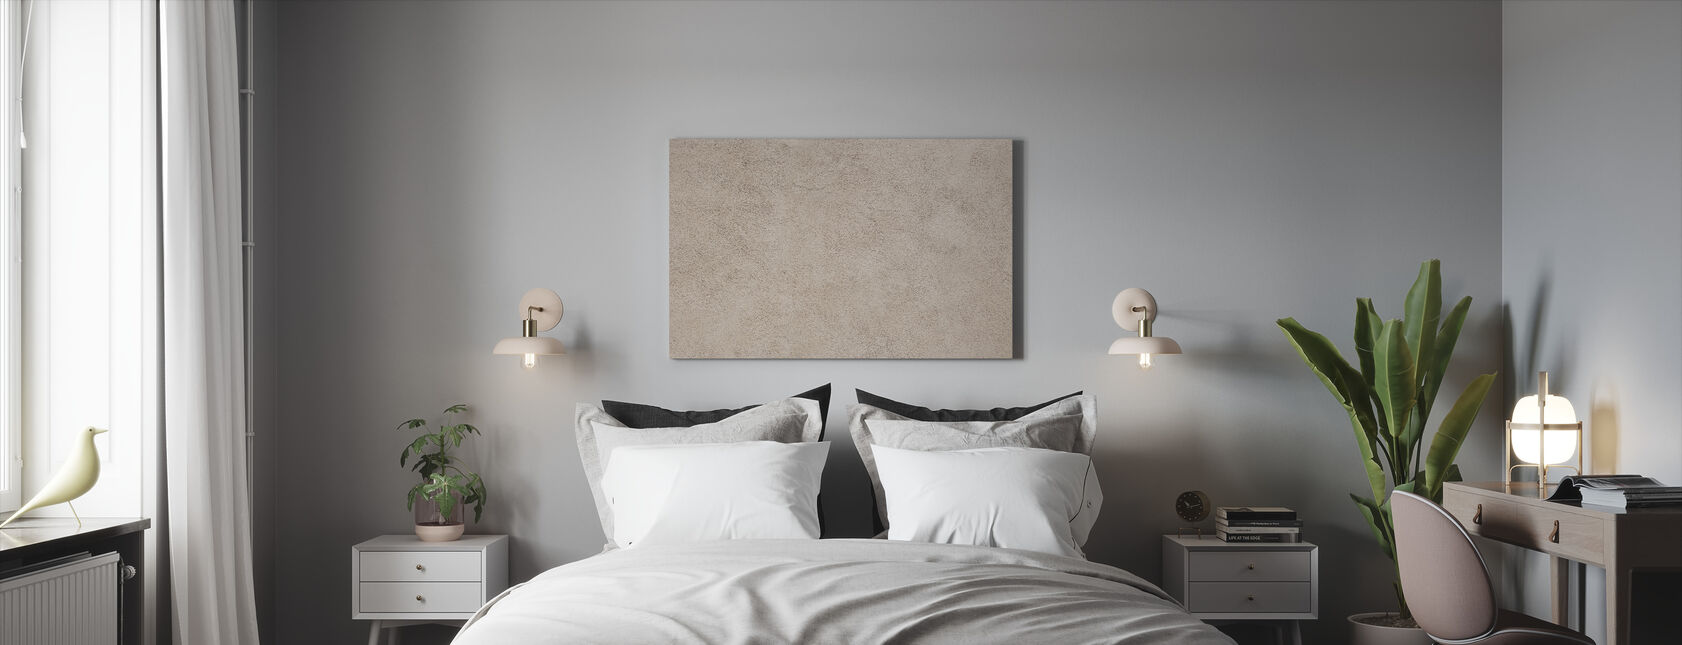 Italian Light Brown Wall - Canvas print - Bedroom